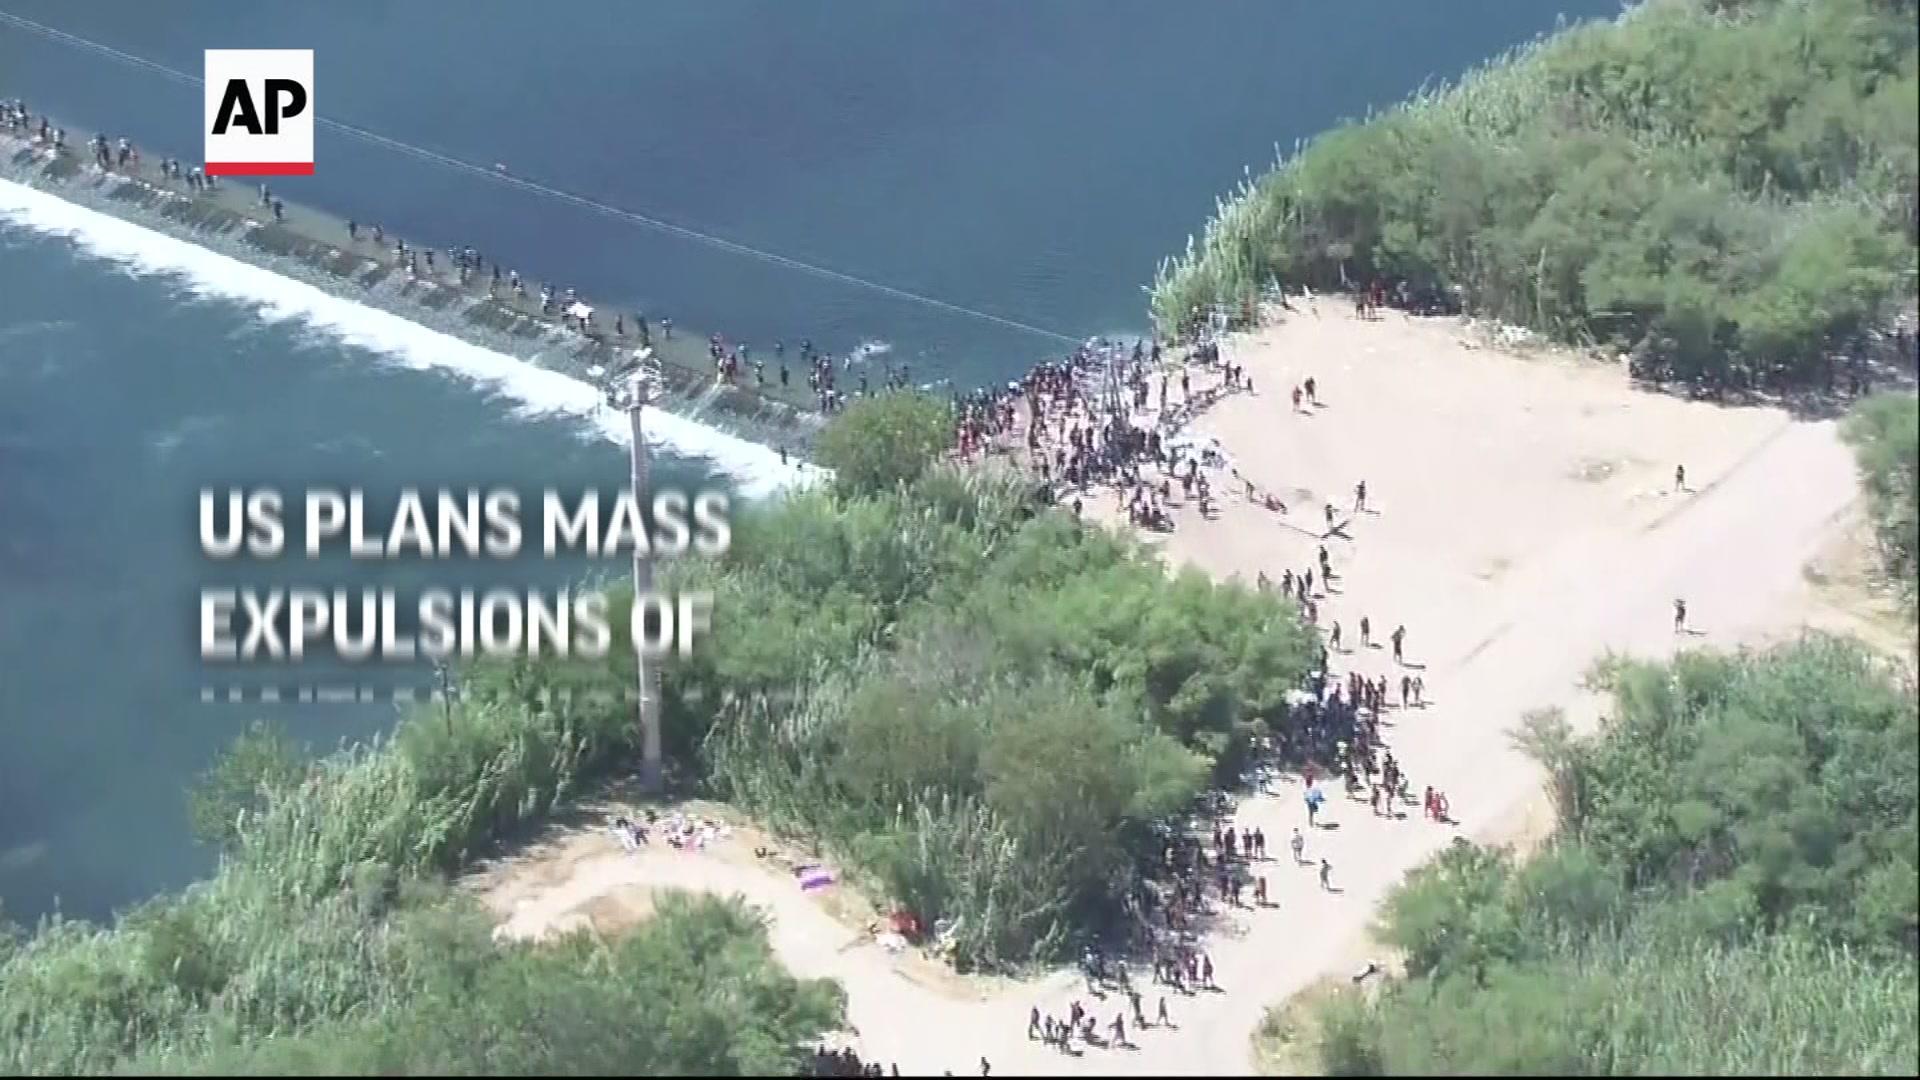 US plans mass expulsions of Haitian migrants